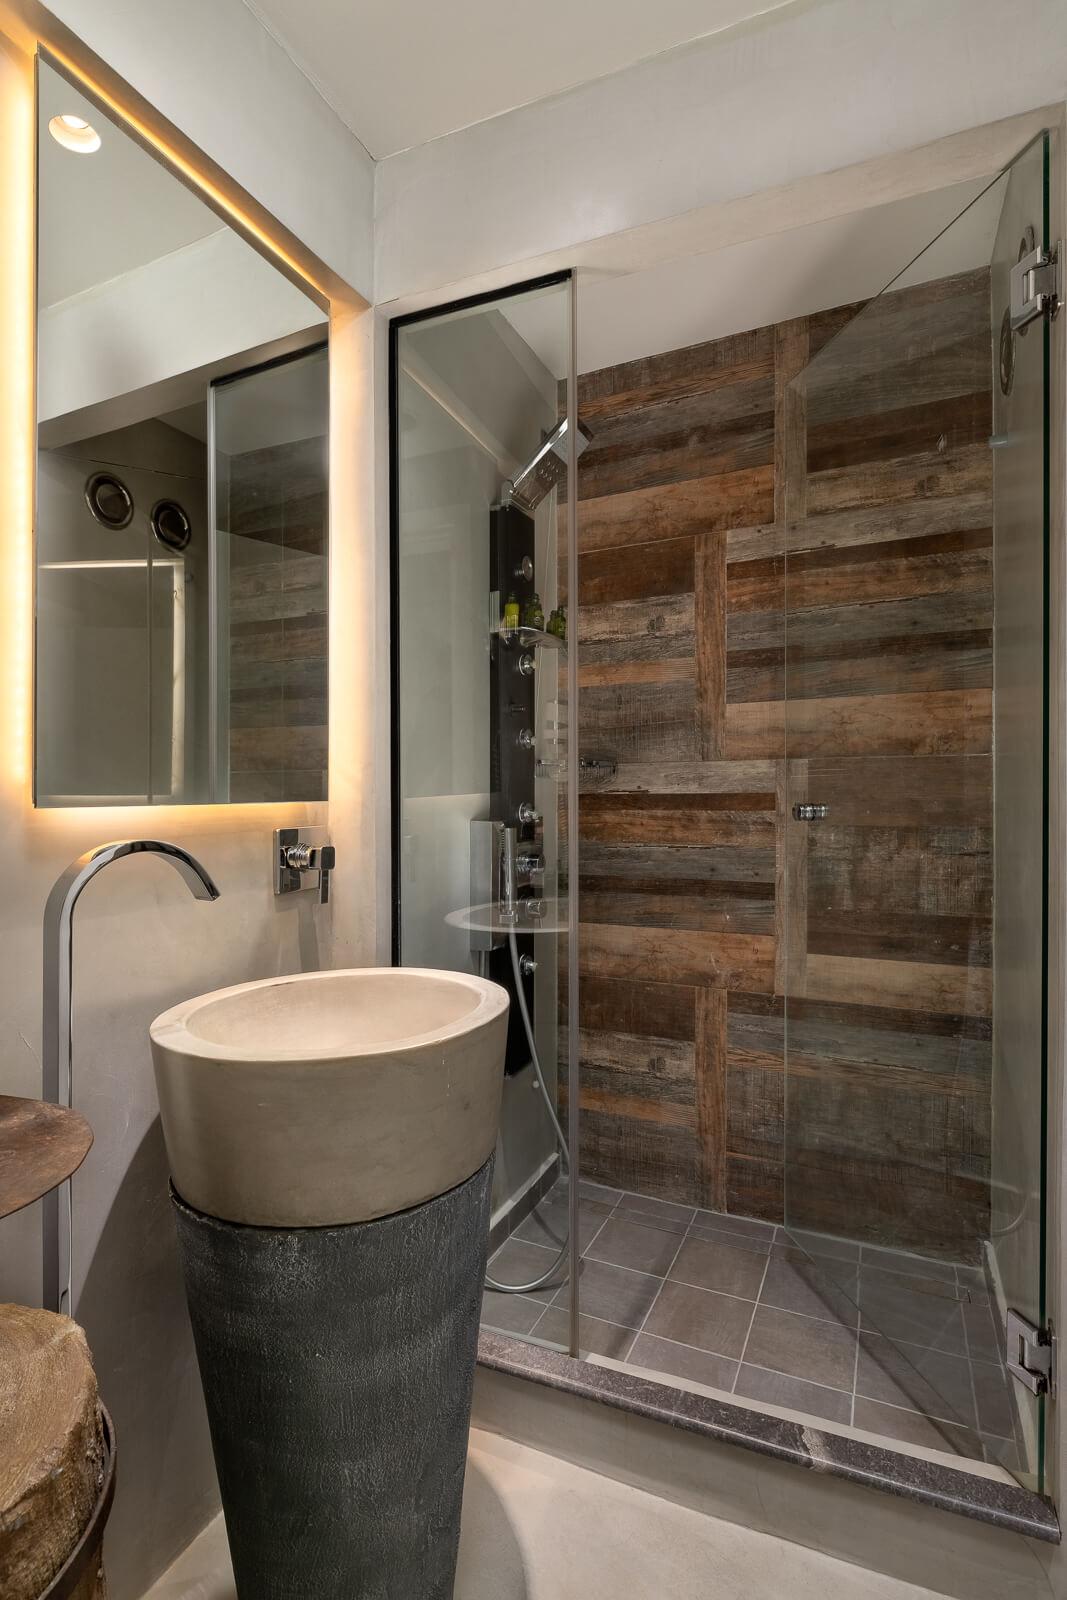 Castro Hotel Bathroom - Elakati Best Hotel in Rhodes Greece